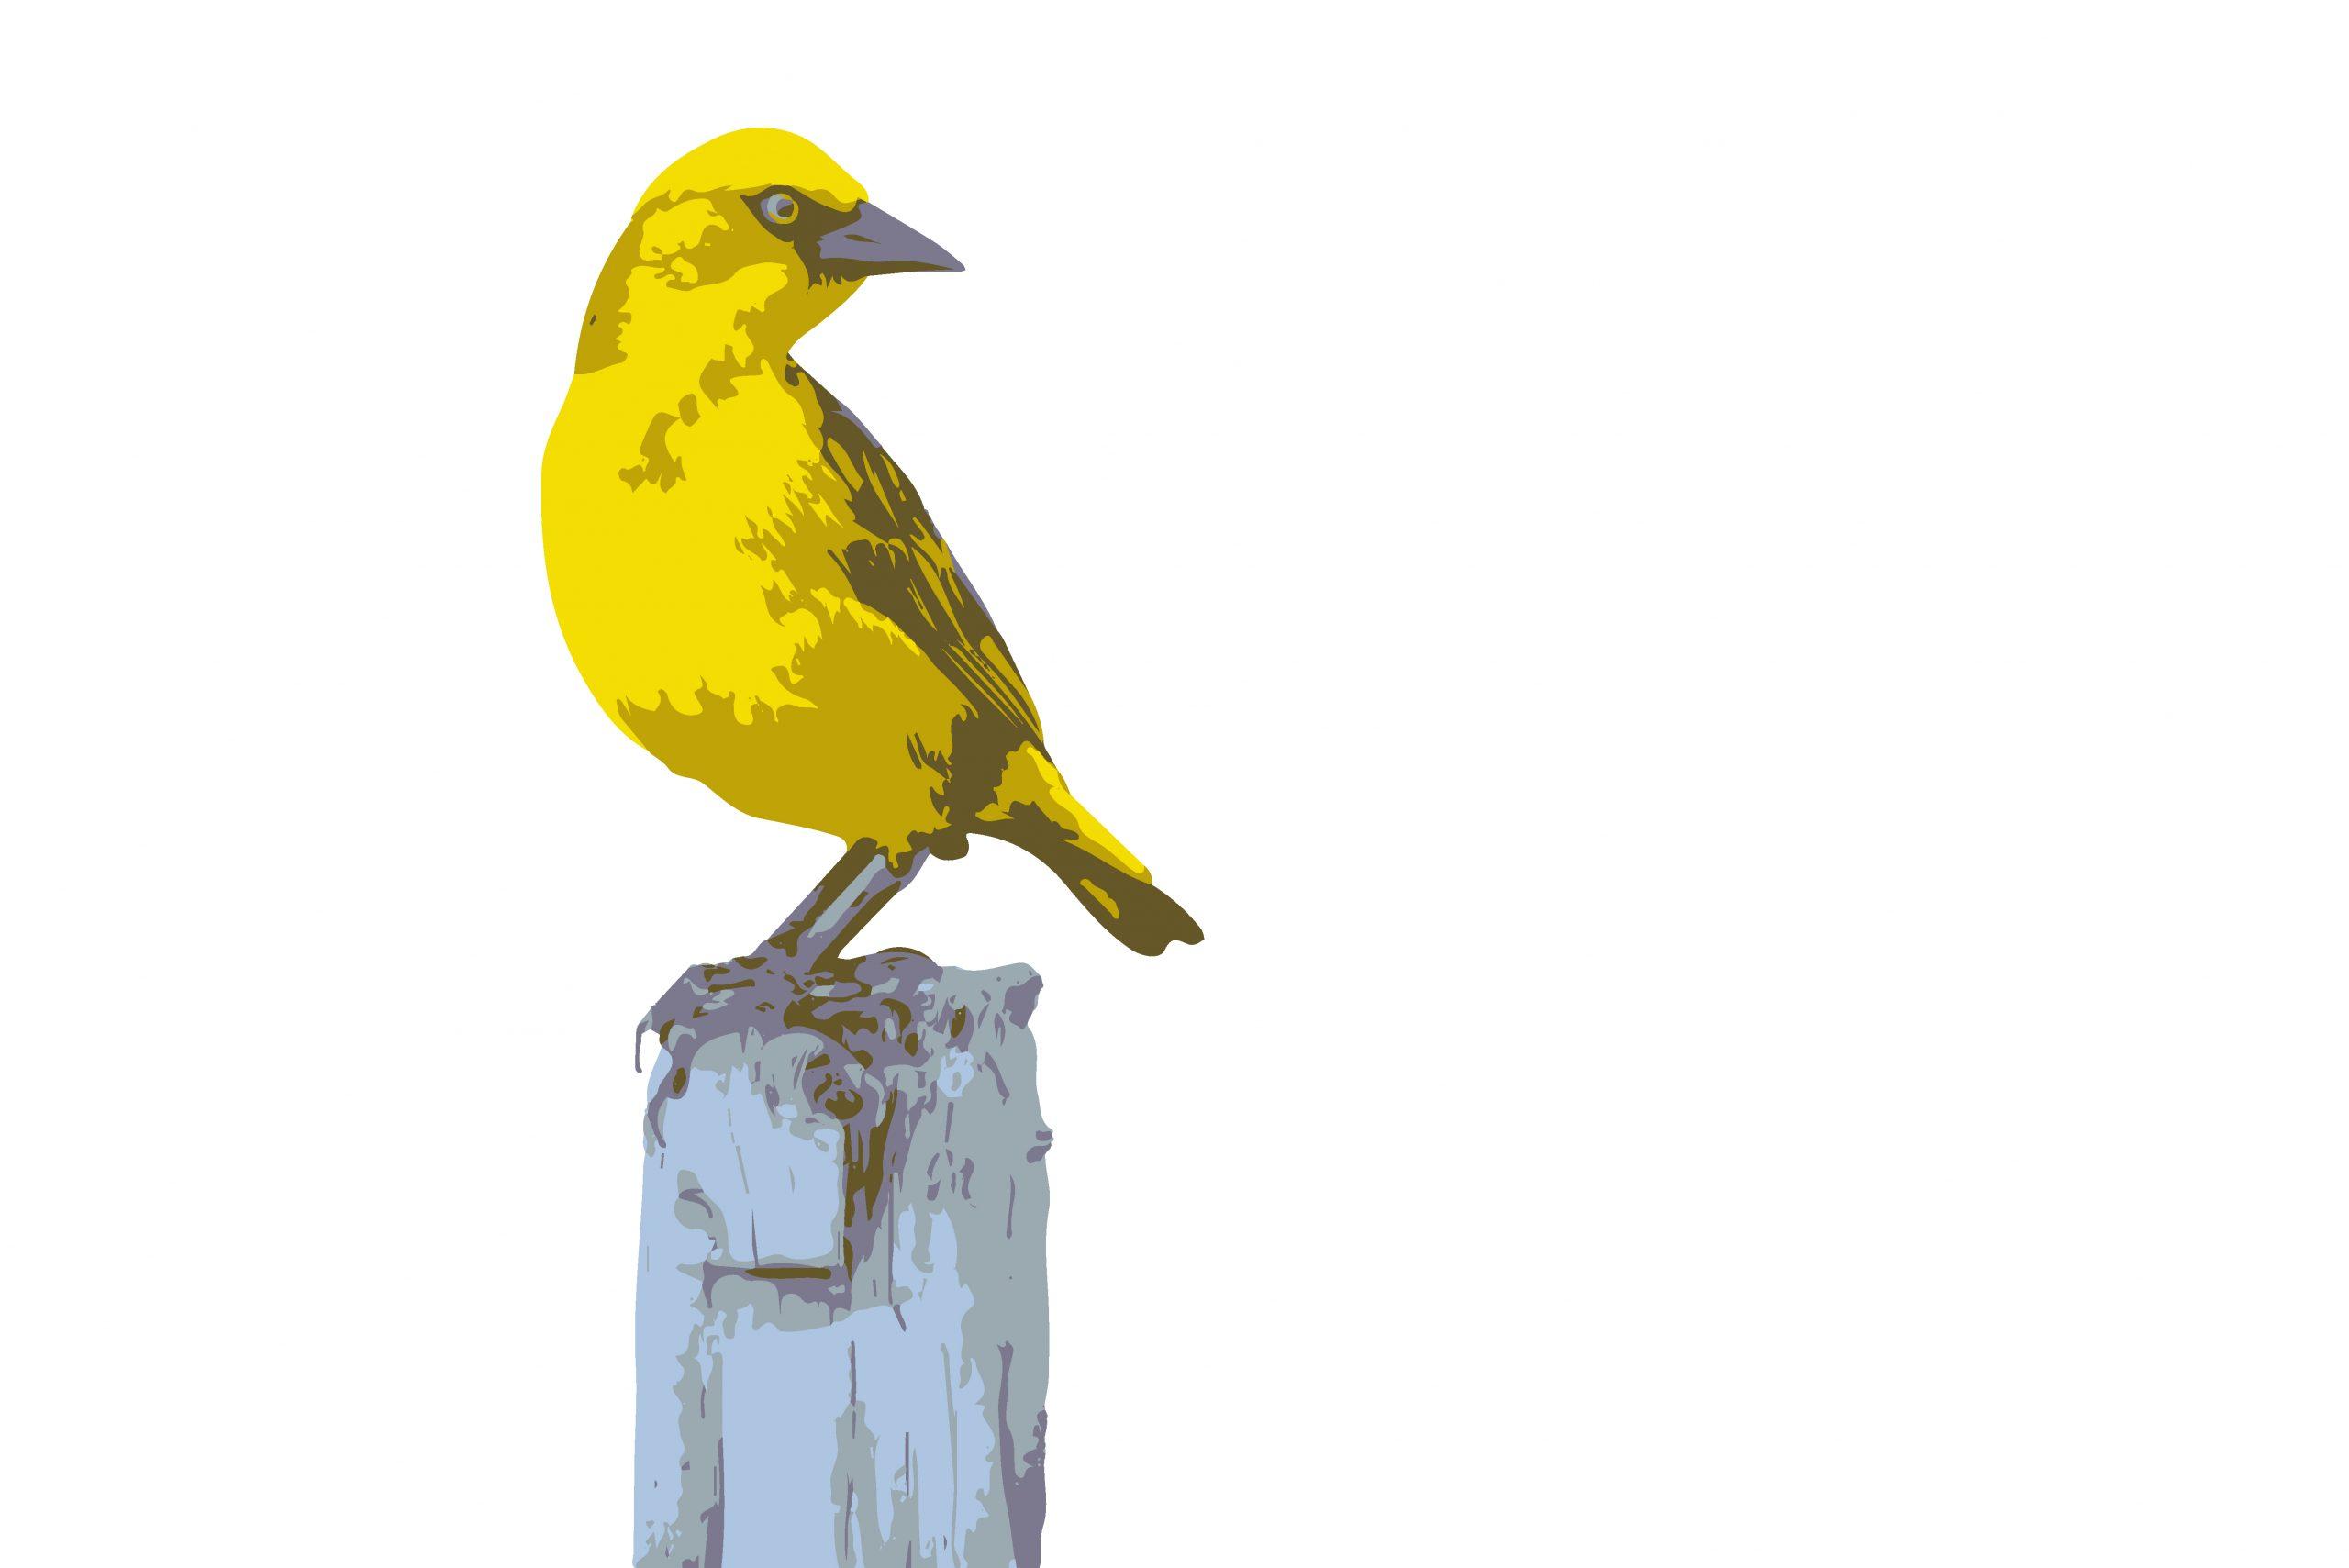 ILLUSTRATION of a bird sitting on the tree